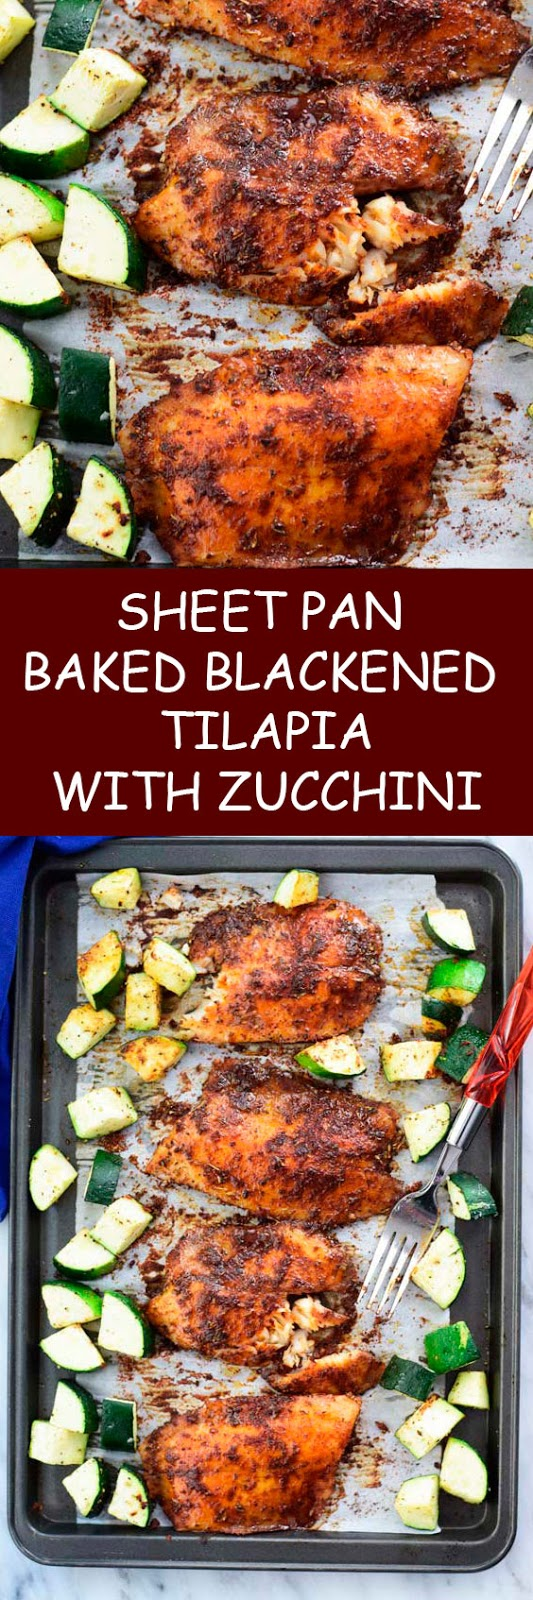 Sheet Pan Baked Blackened Tilapia With Zucchini